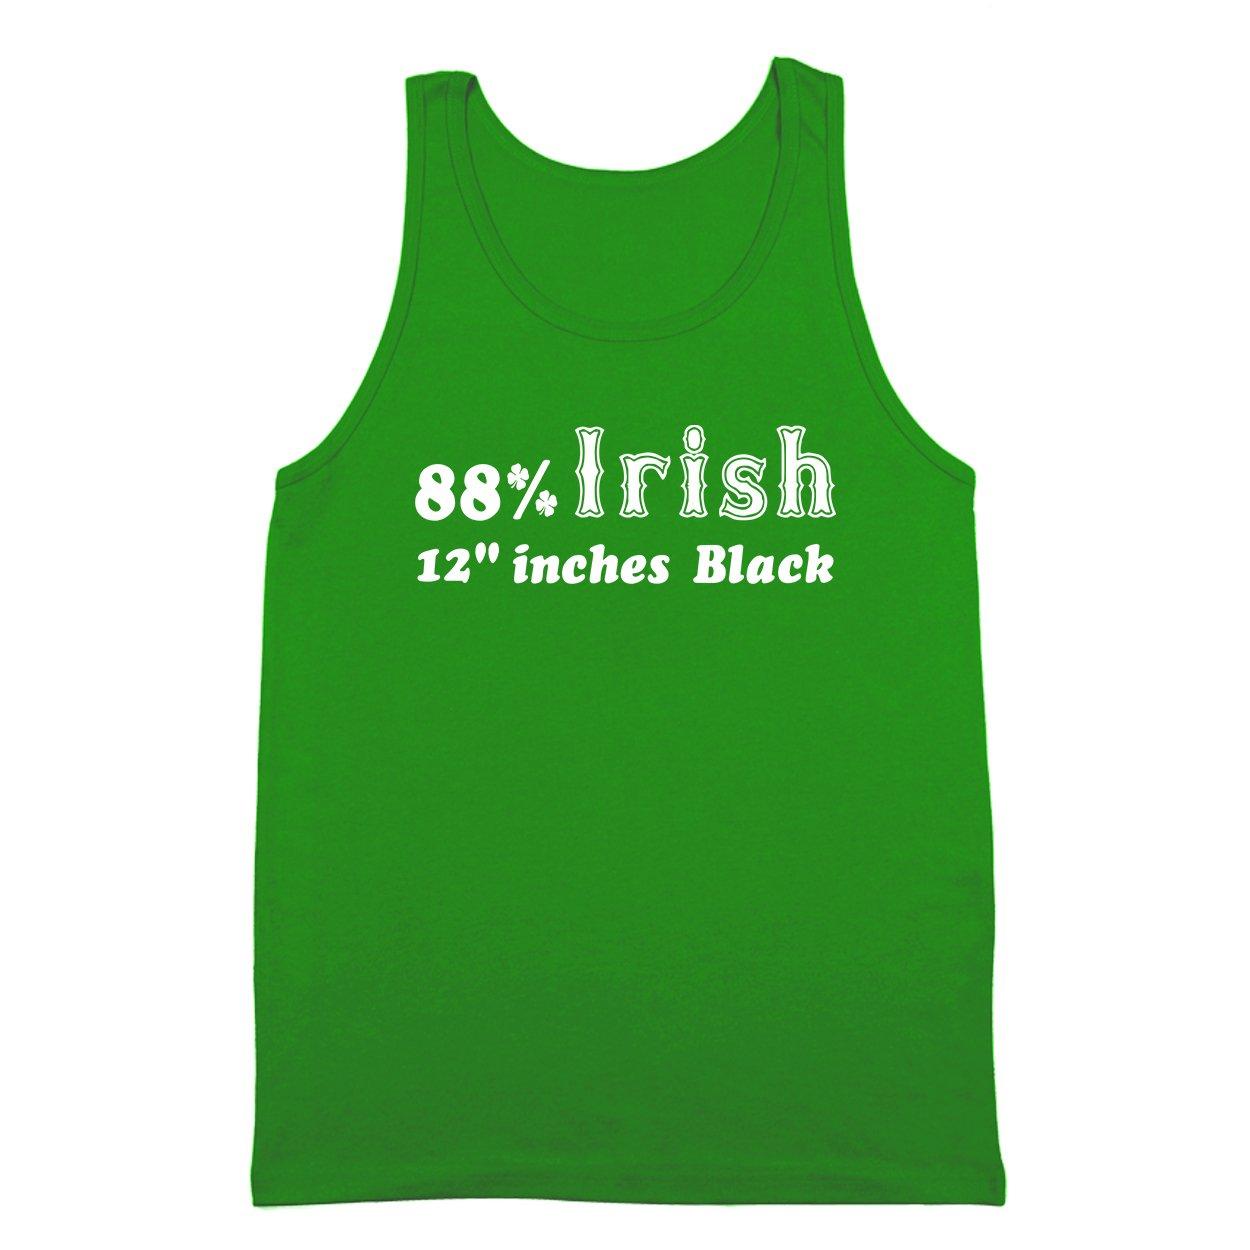 88 Irish 12 Inches Black Funny Dirty Rude Vulgar Sexual Humor Mens Tank Top